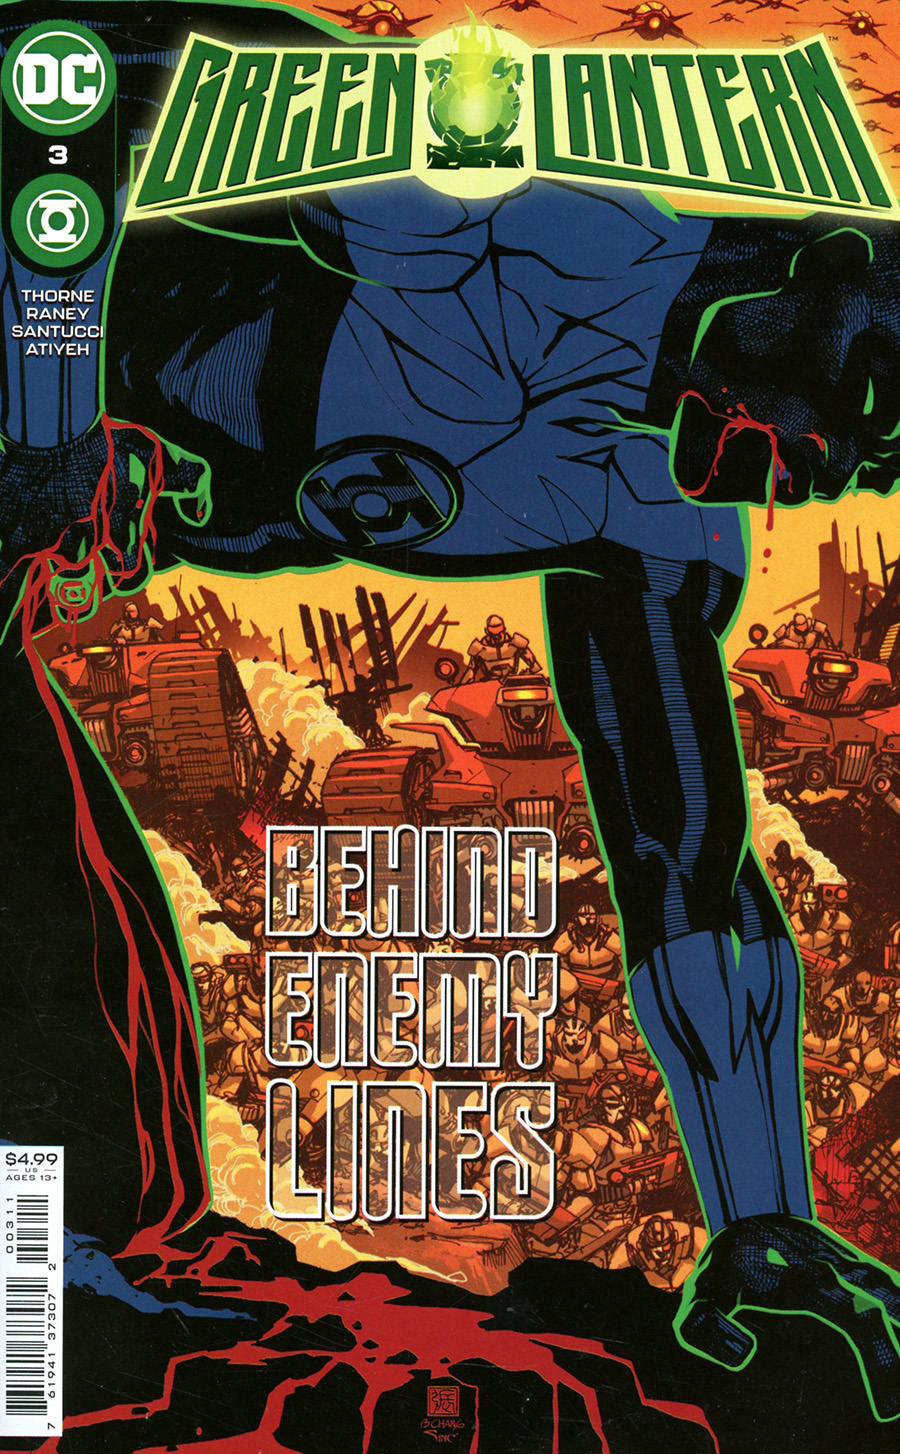 Green Lantern Vol 7 #3 Cover A Regular Bernard Chang Cover